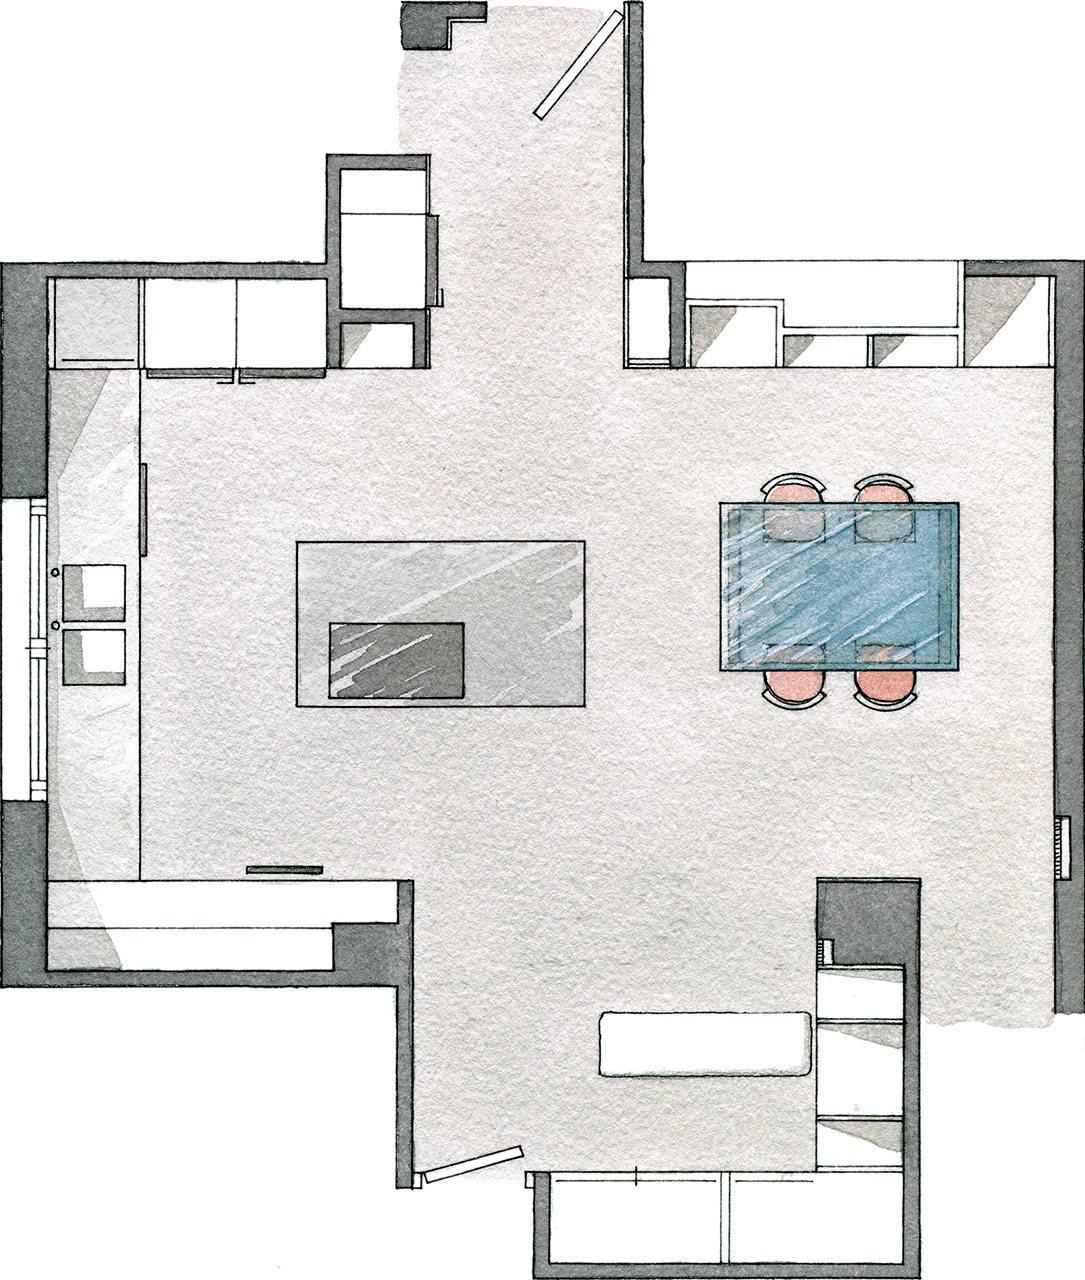 Cocinas con isla planos images for Planos para cocina mejorada